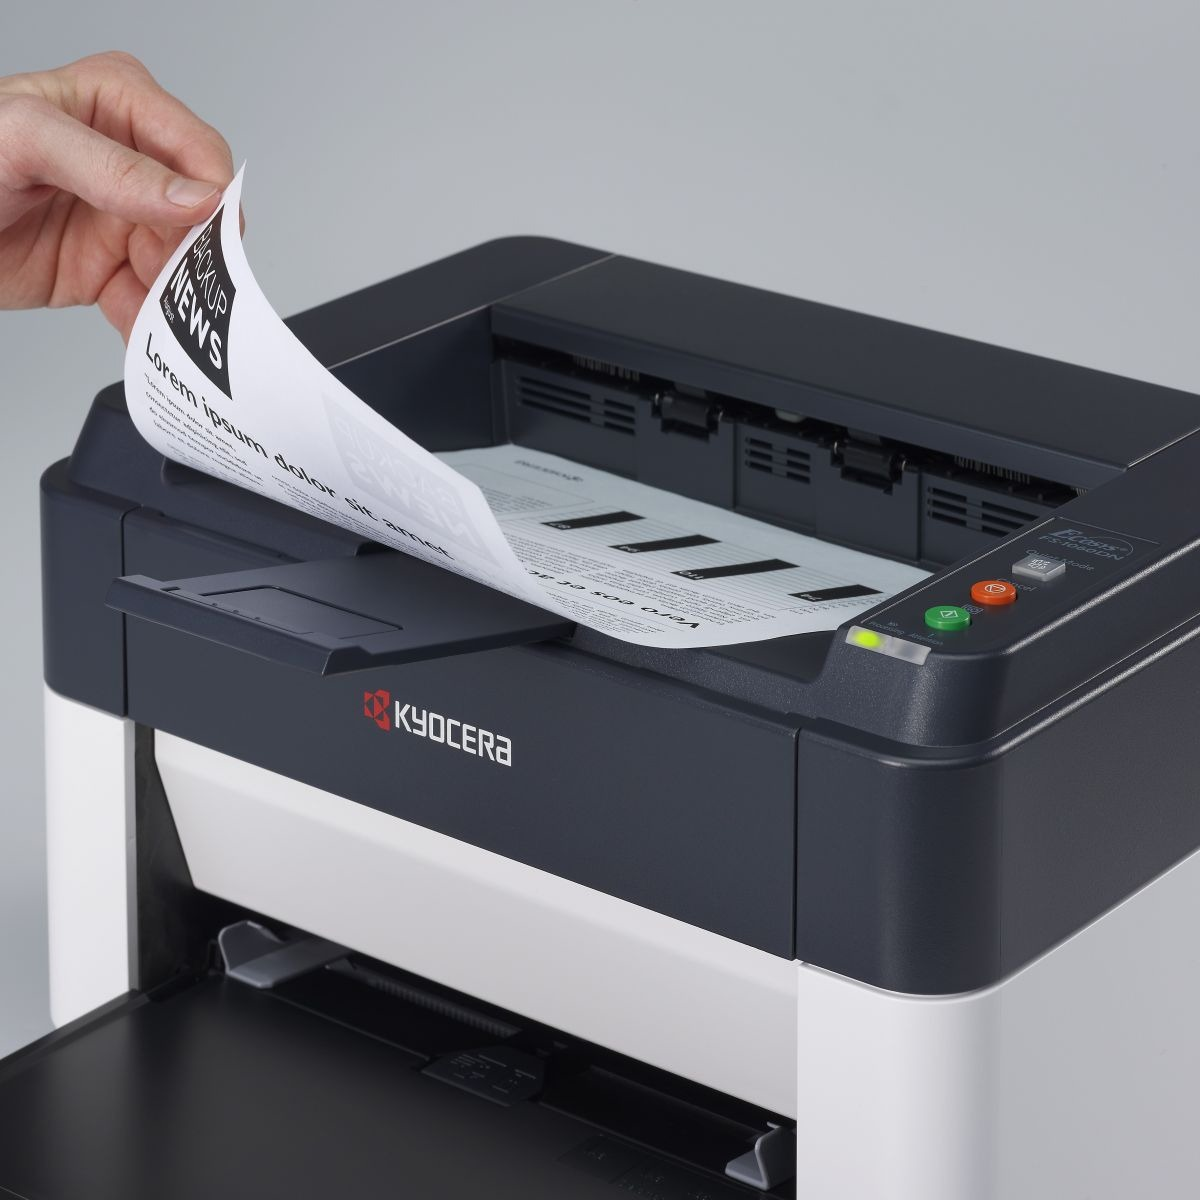 Impresora Láser Kyocera Ecosys Fs-1040 La Mejor Del Segmento - U$S ...